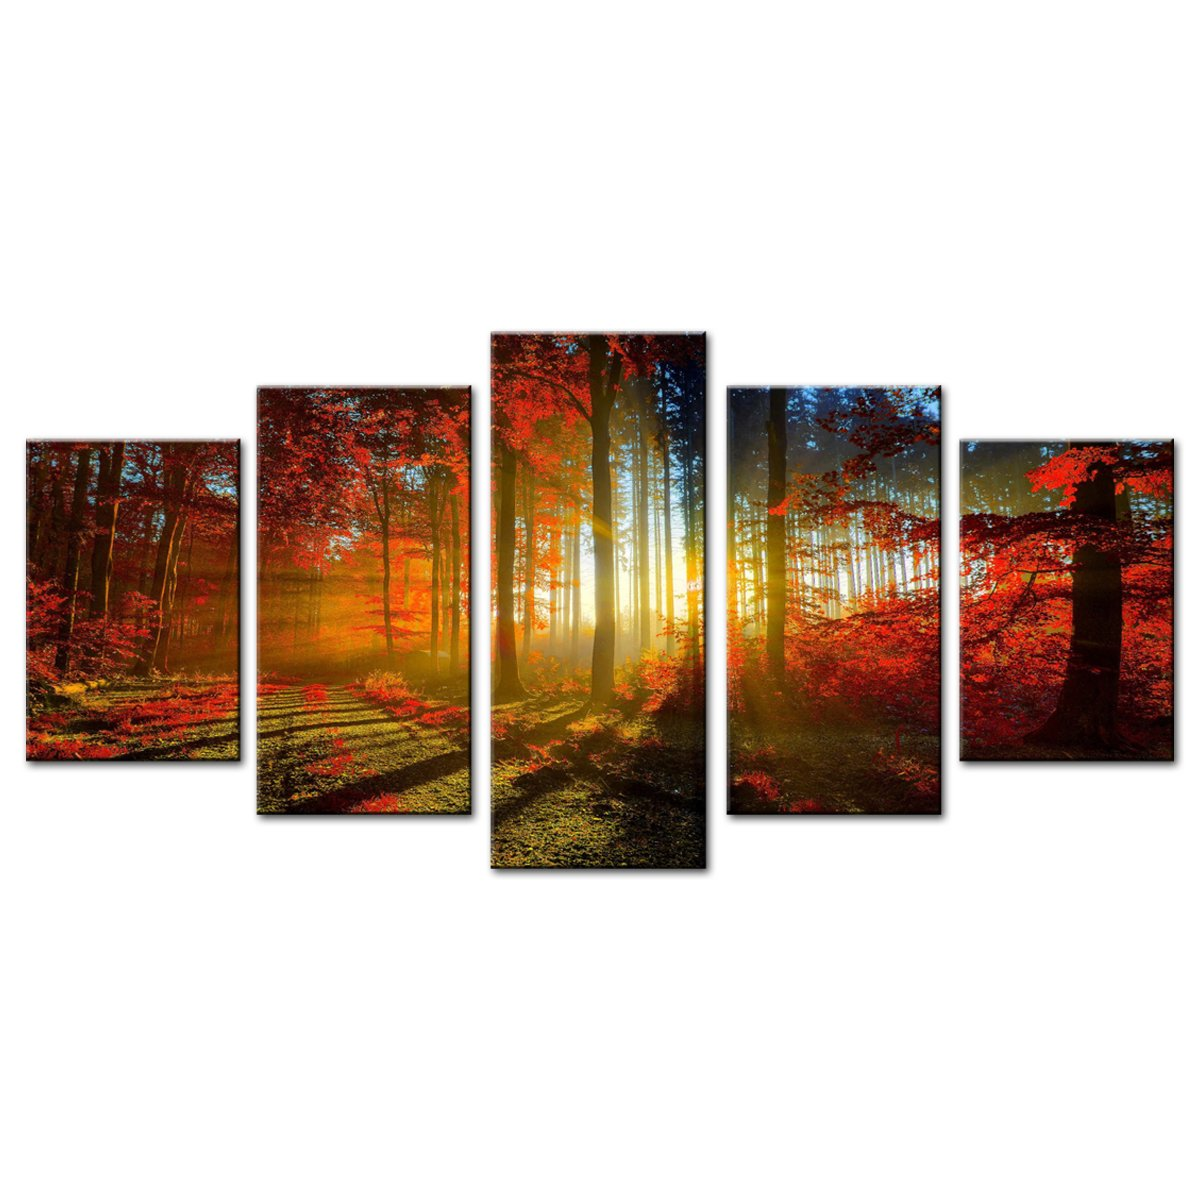 Moco Art 5 Panels Canvas Wall Art Paintings Autumn Beautiful Maple Trees Picture Prints On Canvas Landscape Artwork For Home Decor Framed Ready to Hang (30x45cmx2pcs 30x60cmx2pcs 30x75cmx1pcs)